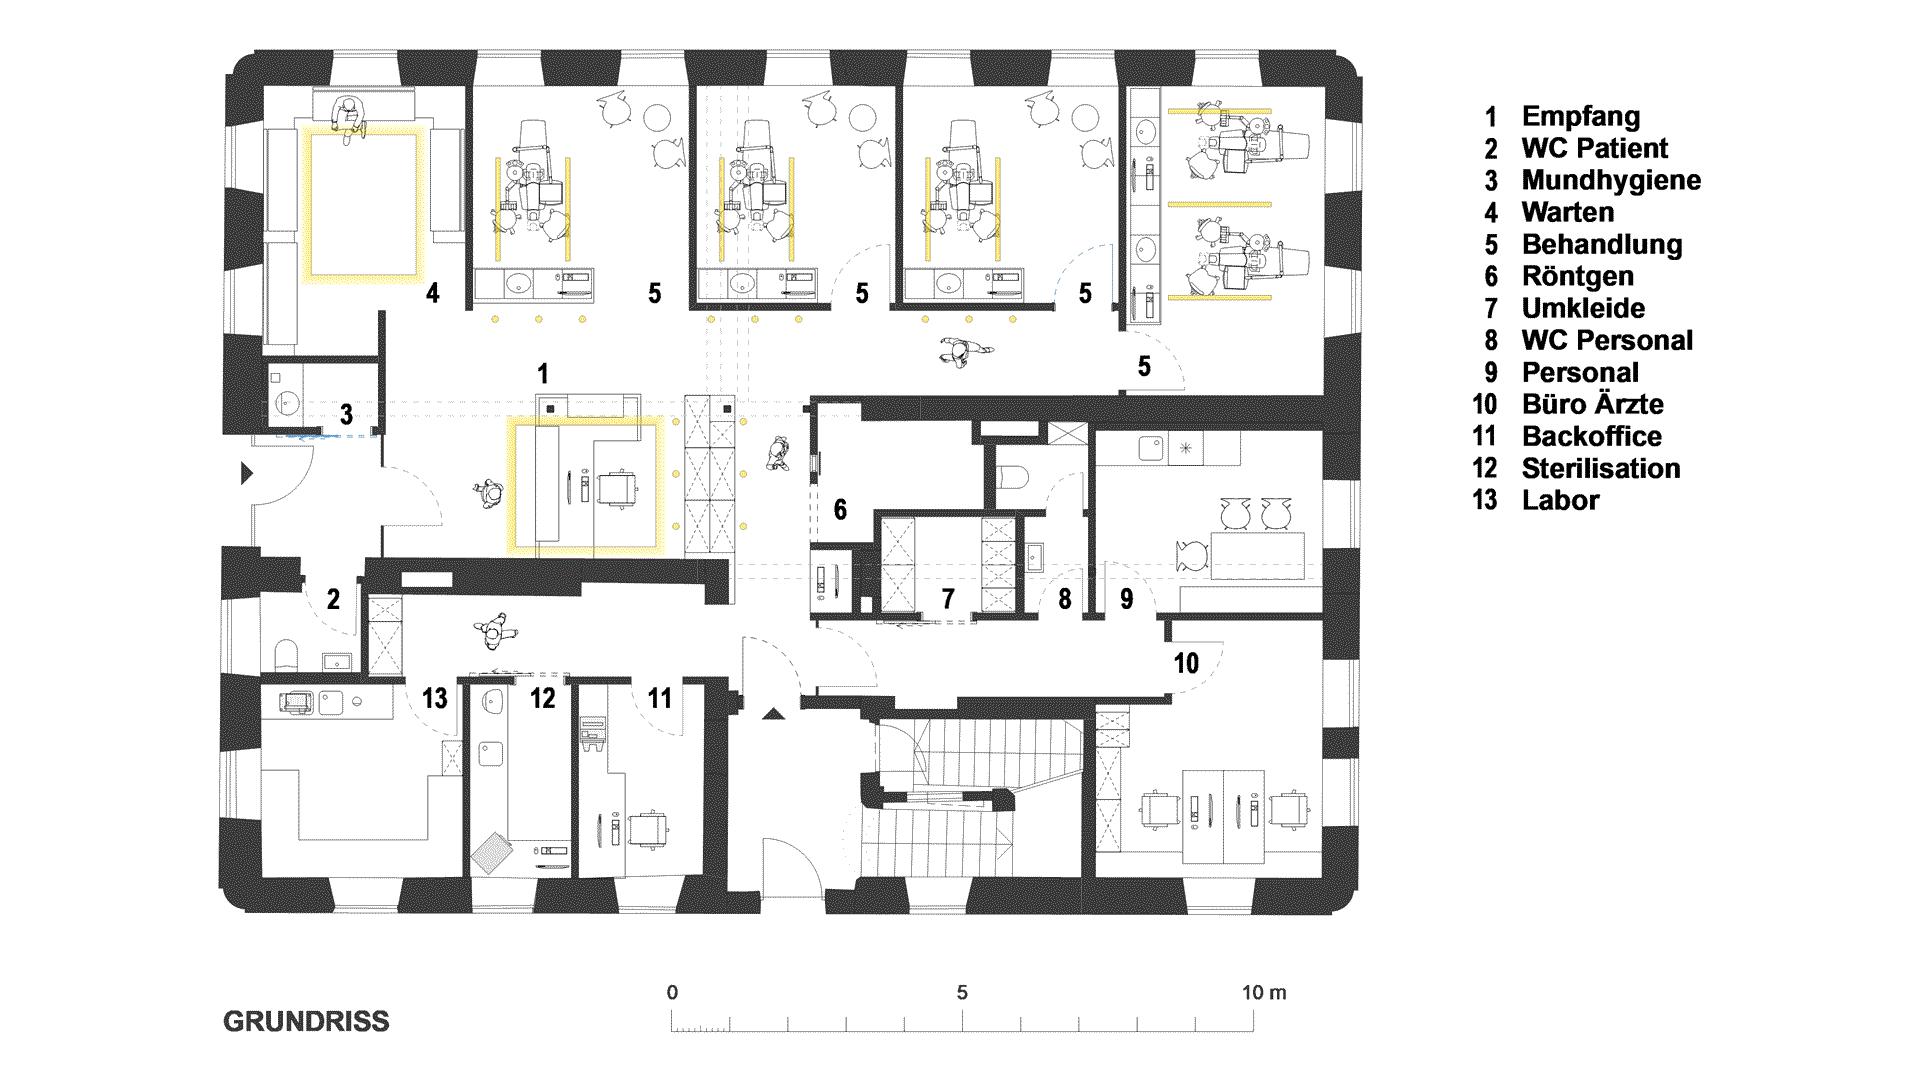 ZA Praxis in Wolnzach / Grundriss